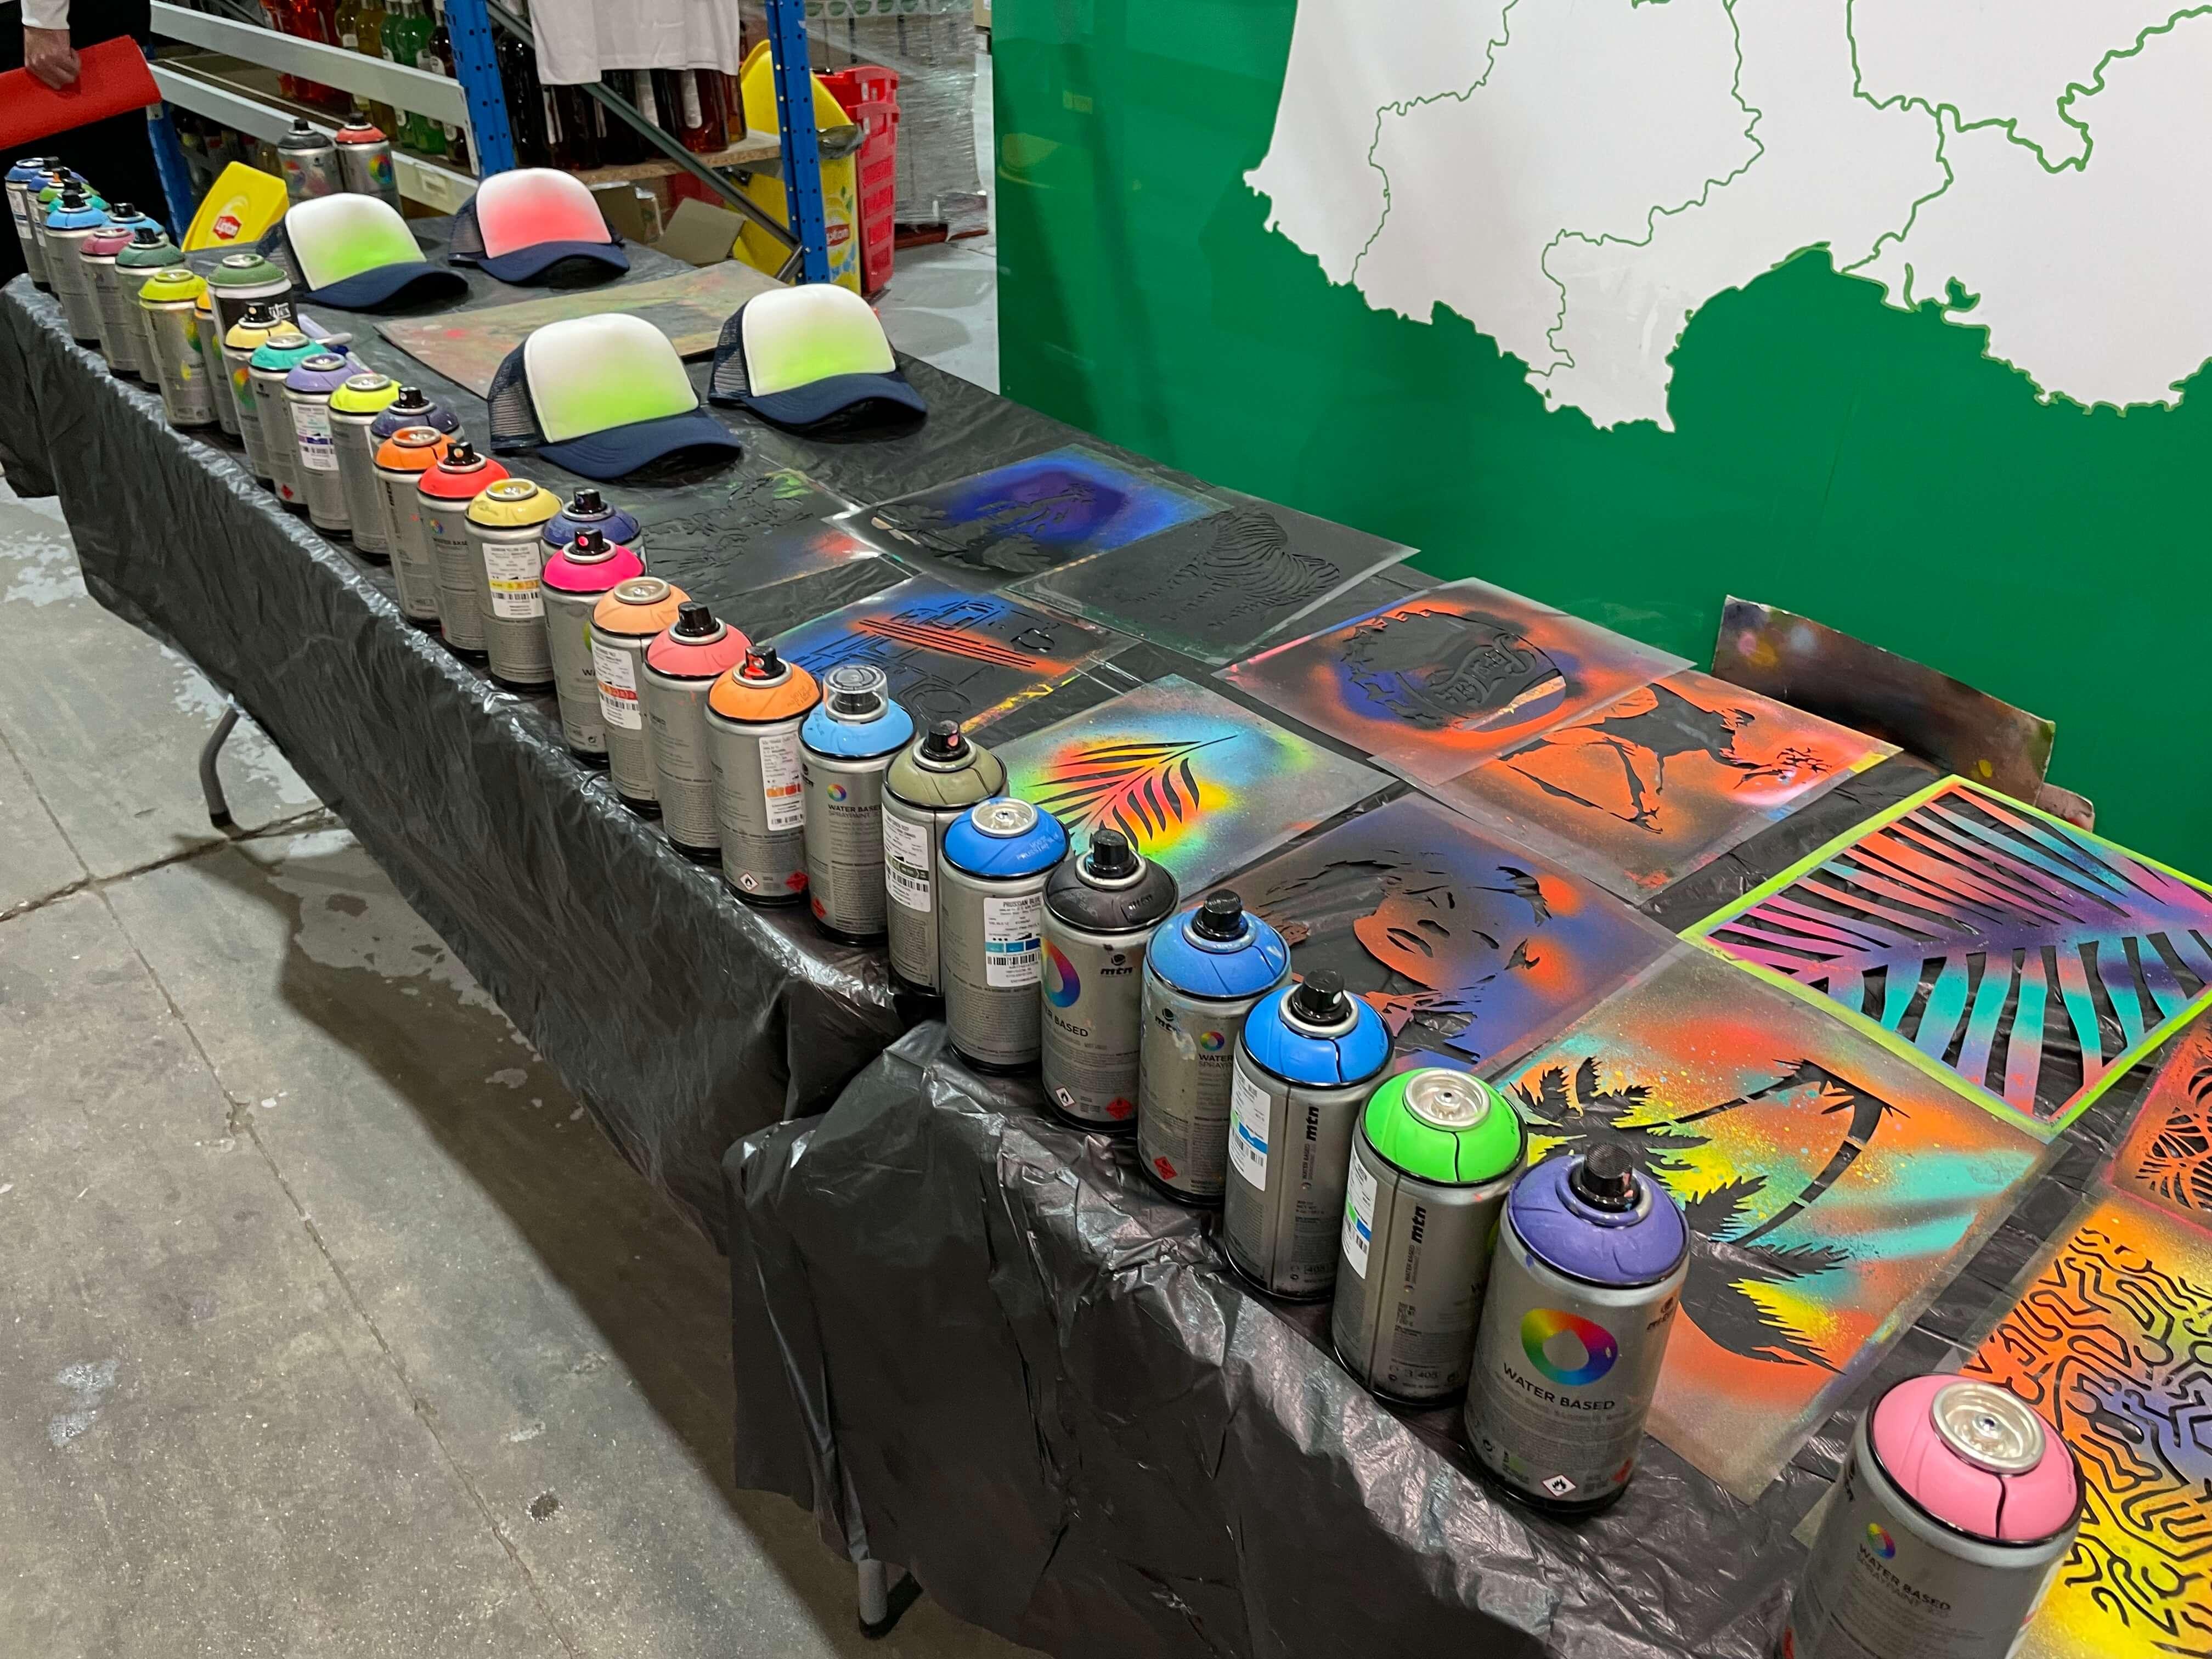 Bar à customisation d'objet street art avec des bombes de peinture